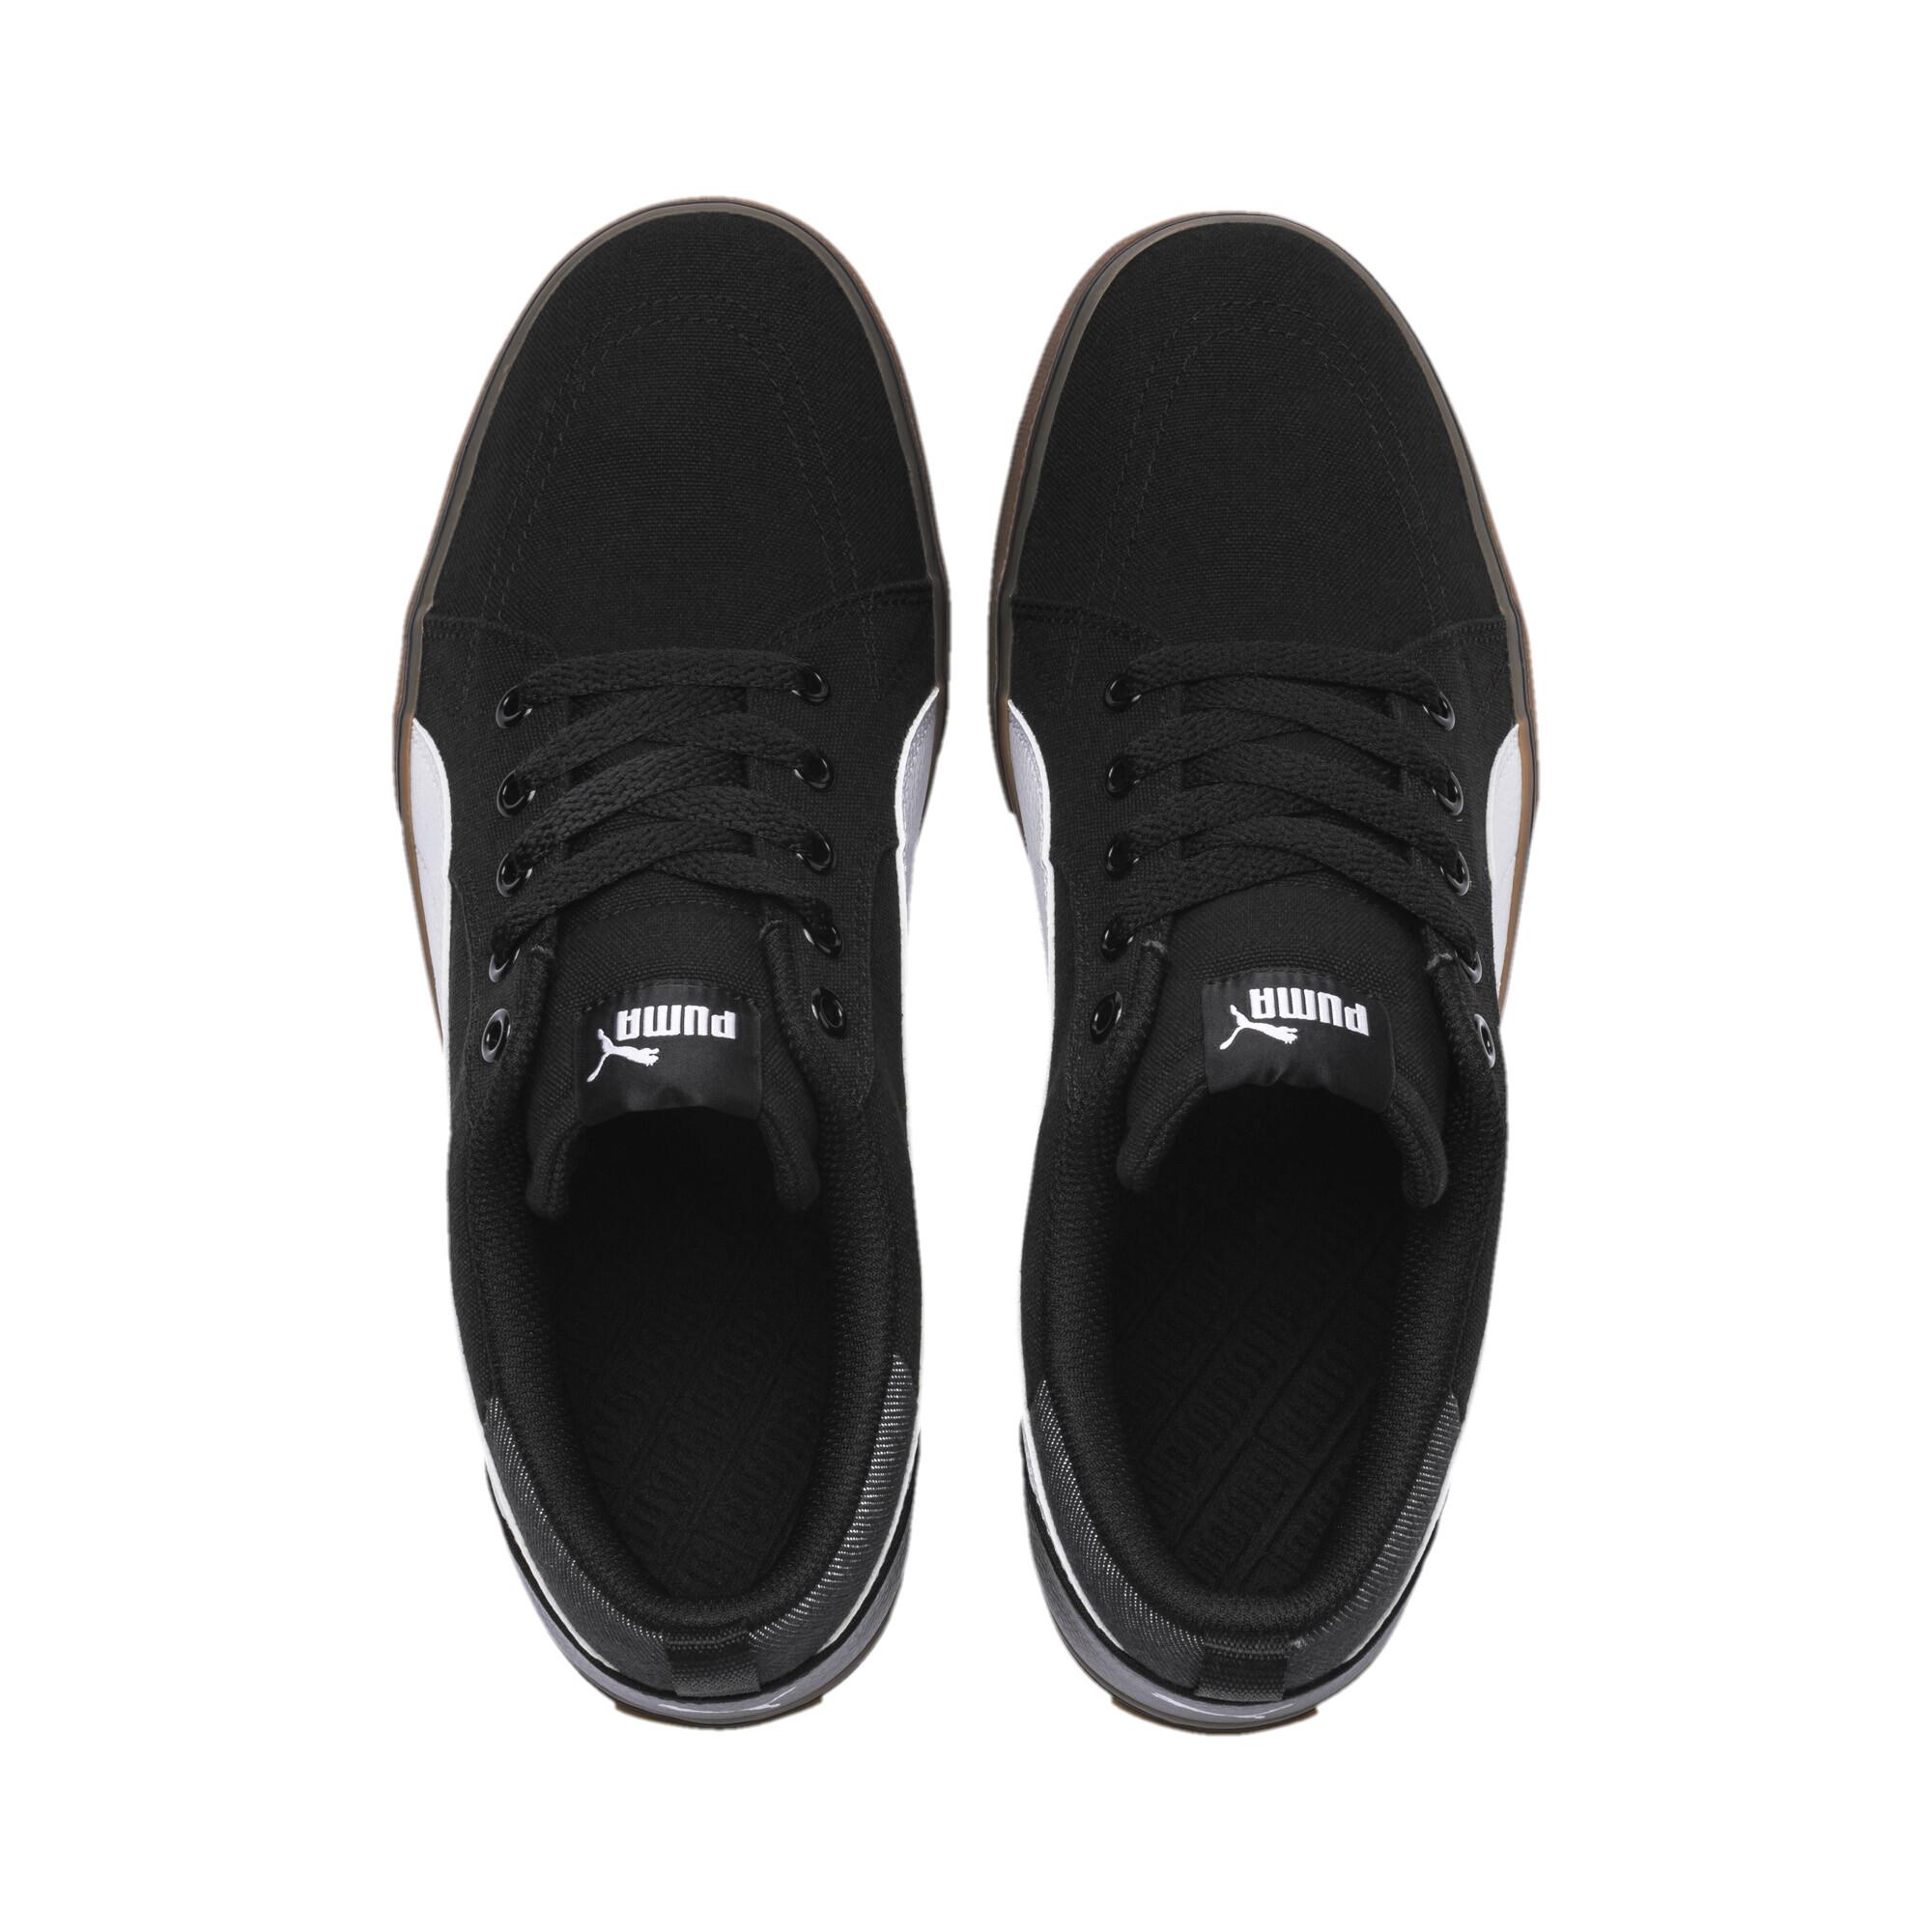 PUMA-PUMA-Bridger-Men-039-s-Sneakers-Men-Shoe-Basics thumbnail 7